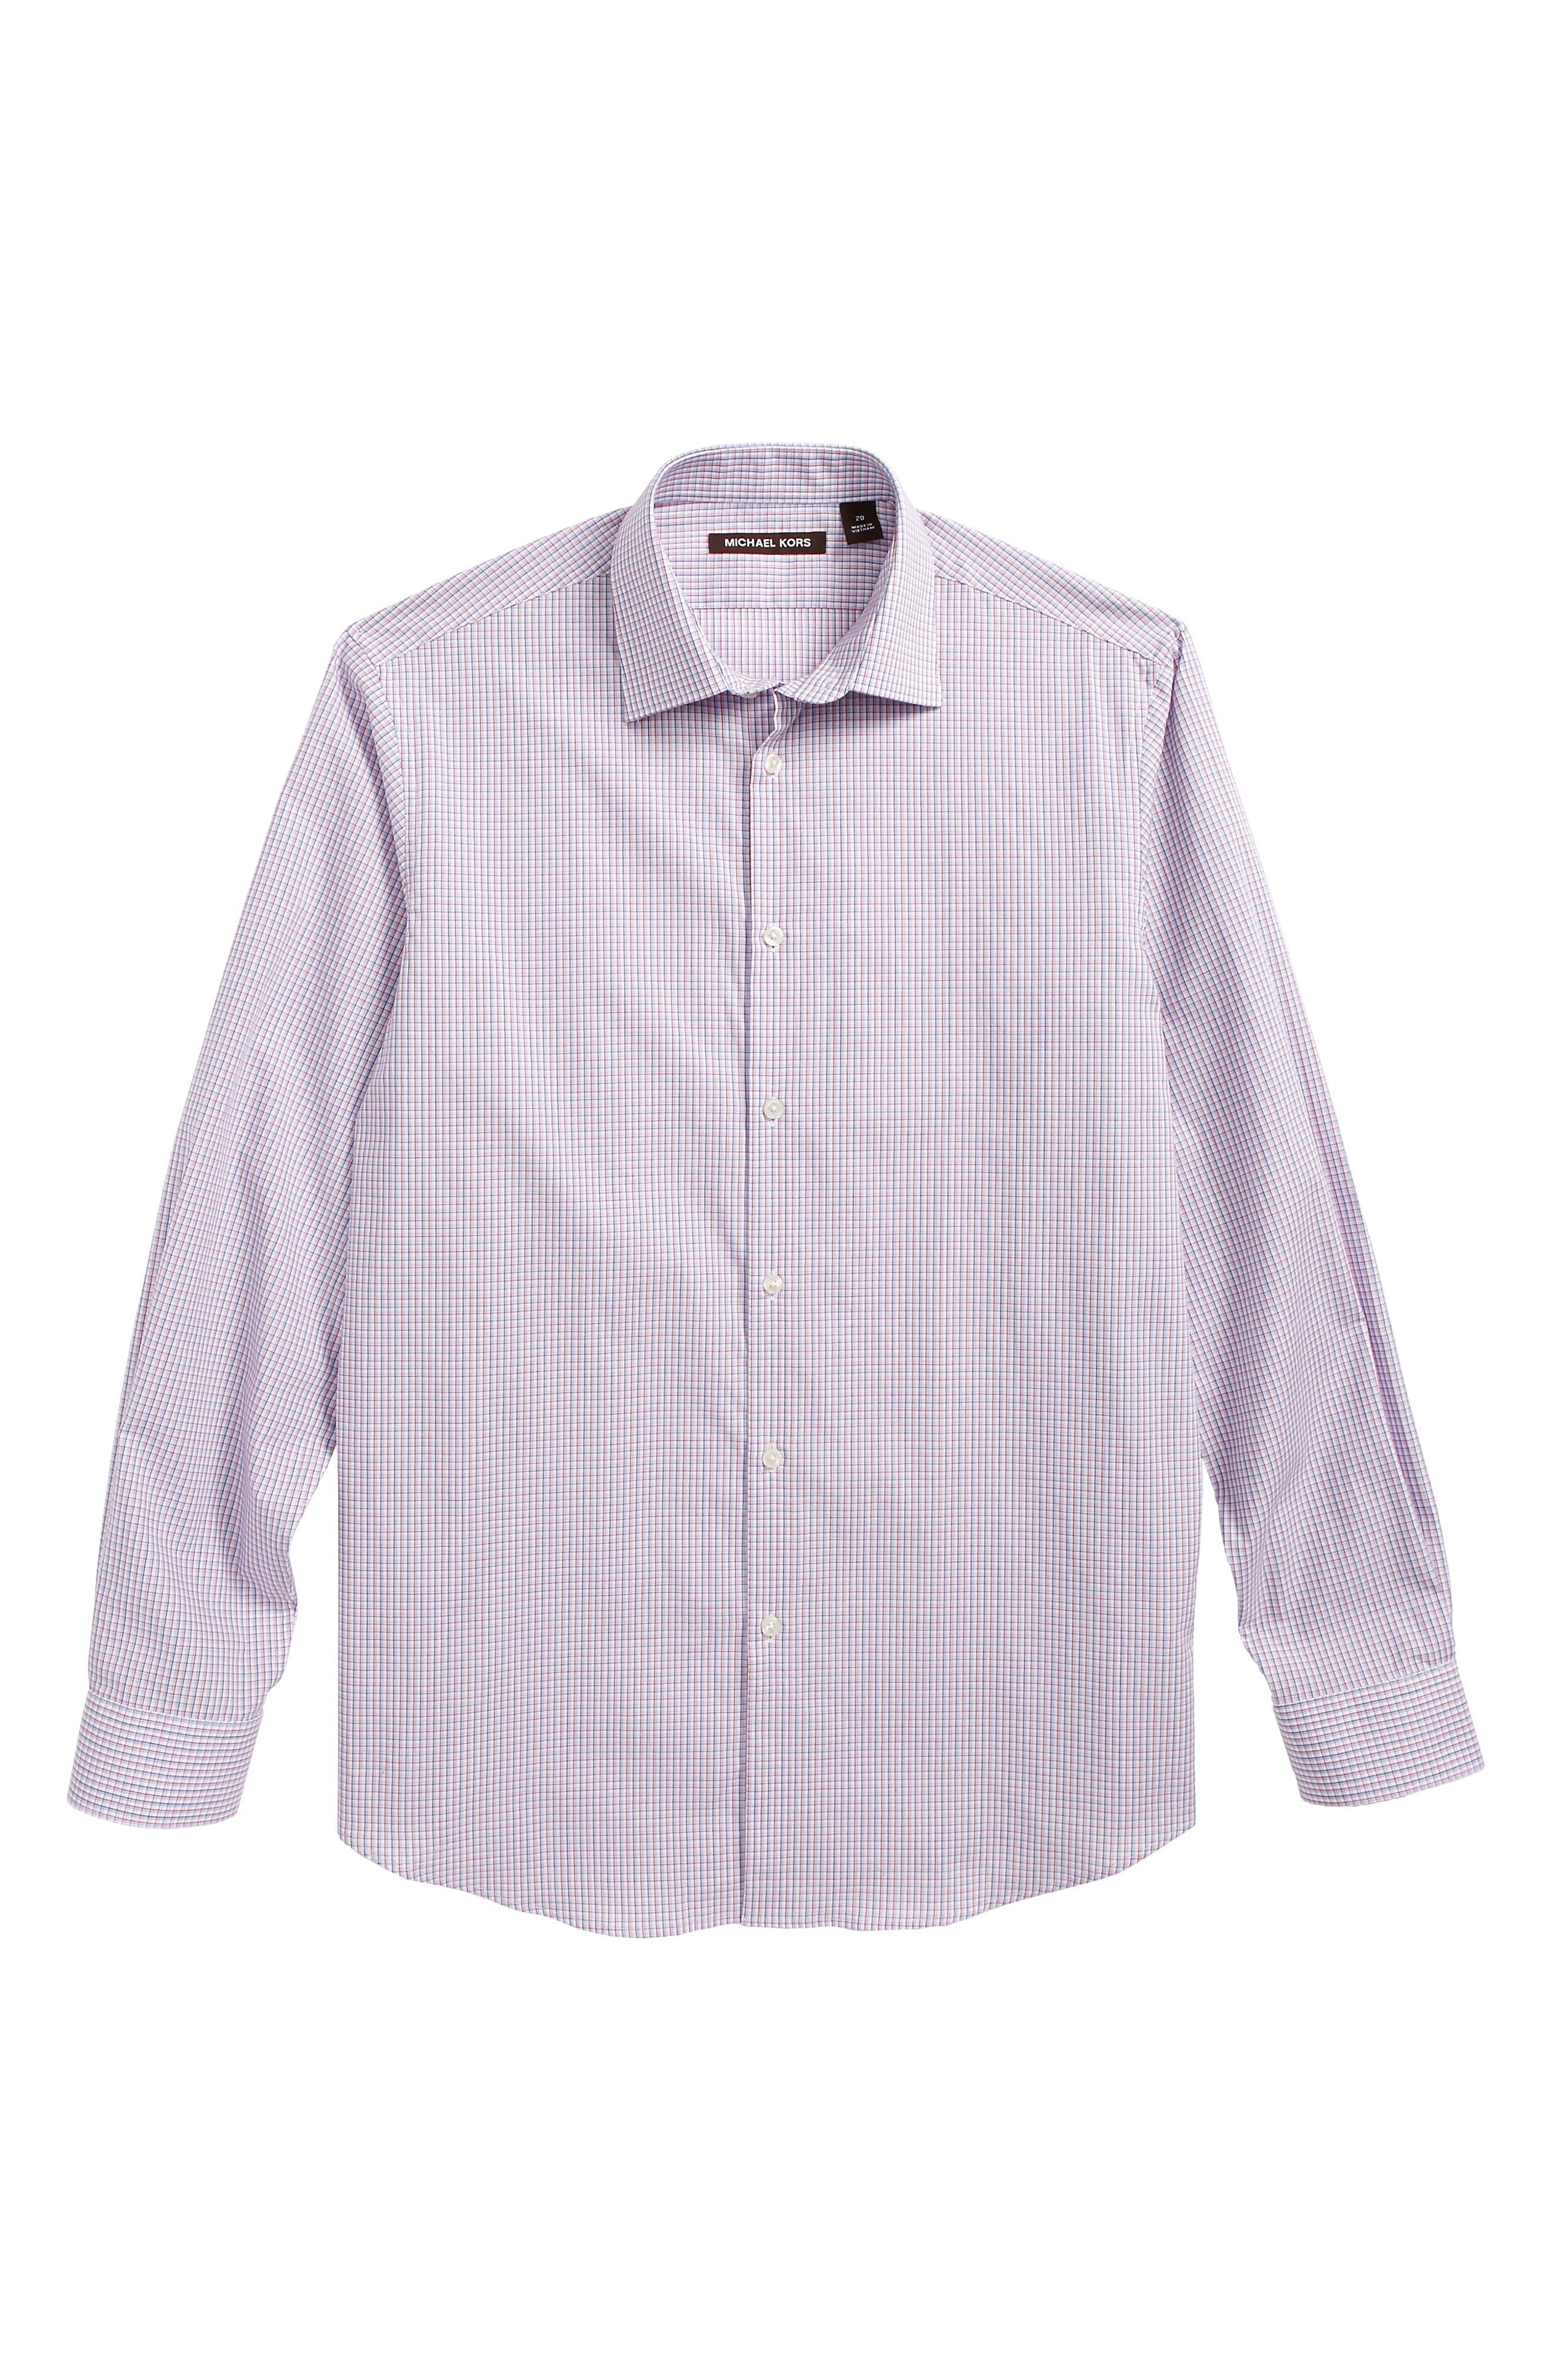 Check Dress Shirt,                         Main,                         color, Red/ Blue Check